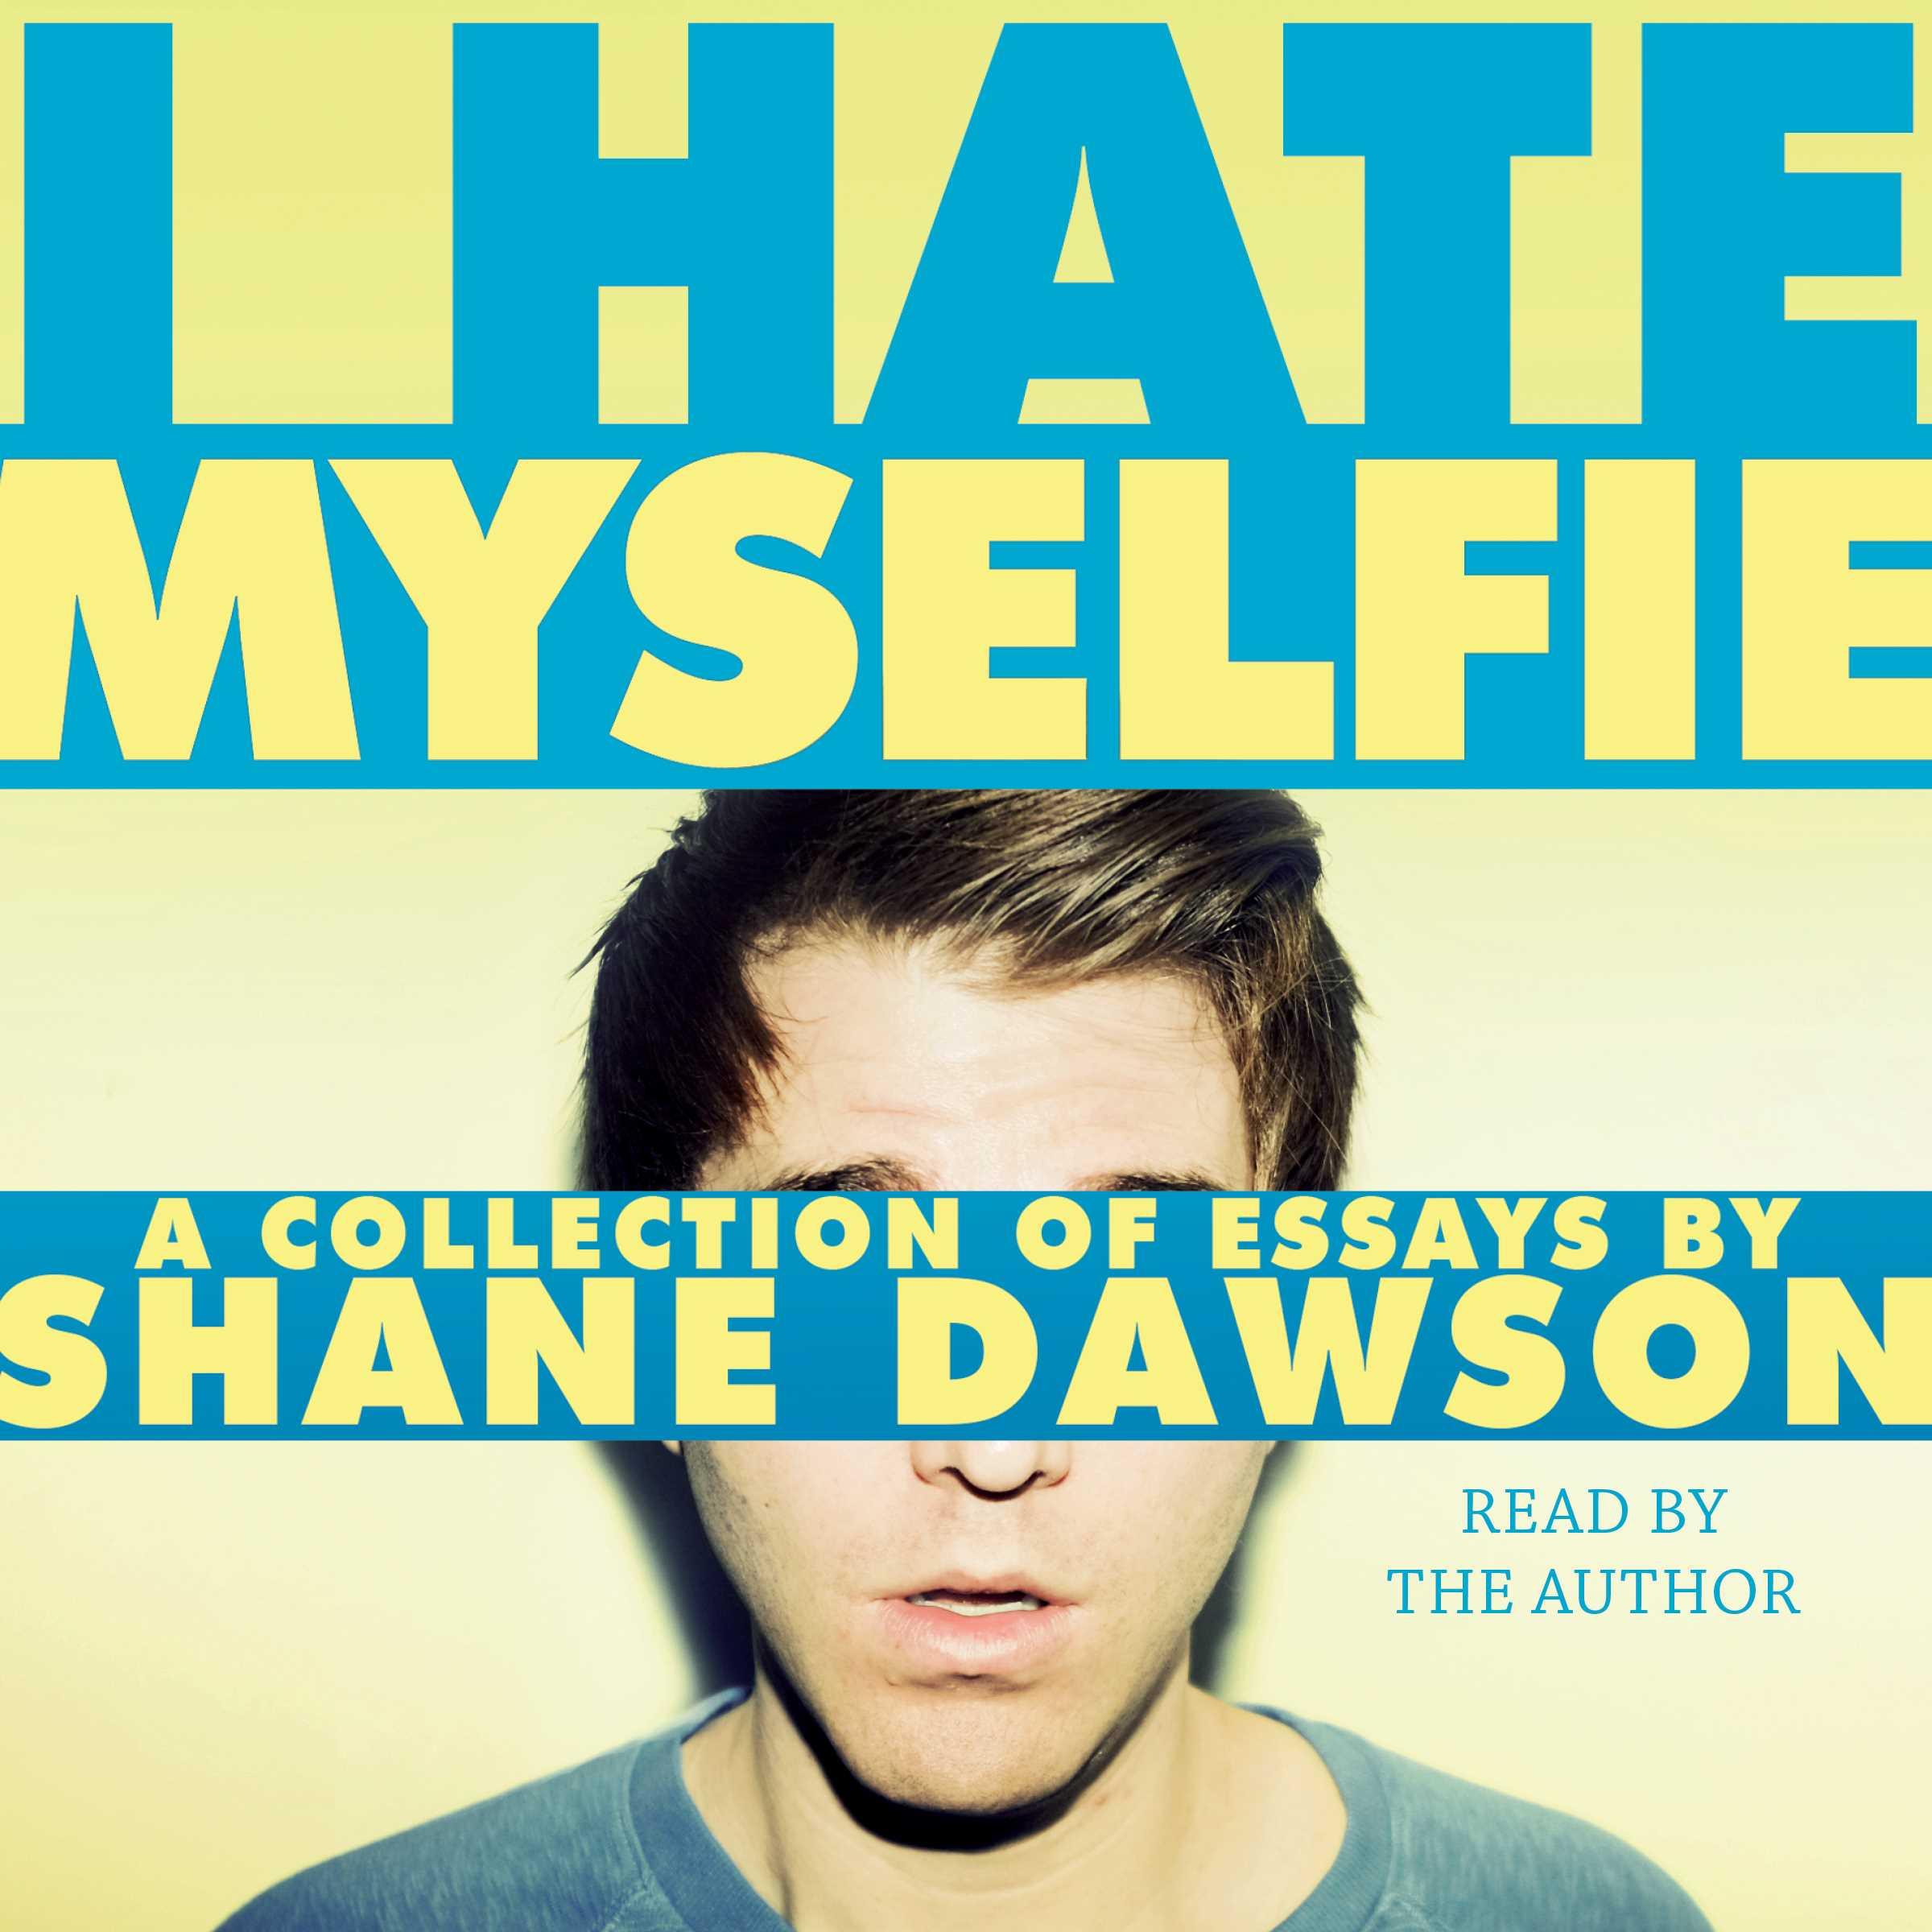 shane dawson i hate myselfie audiobook